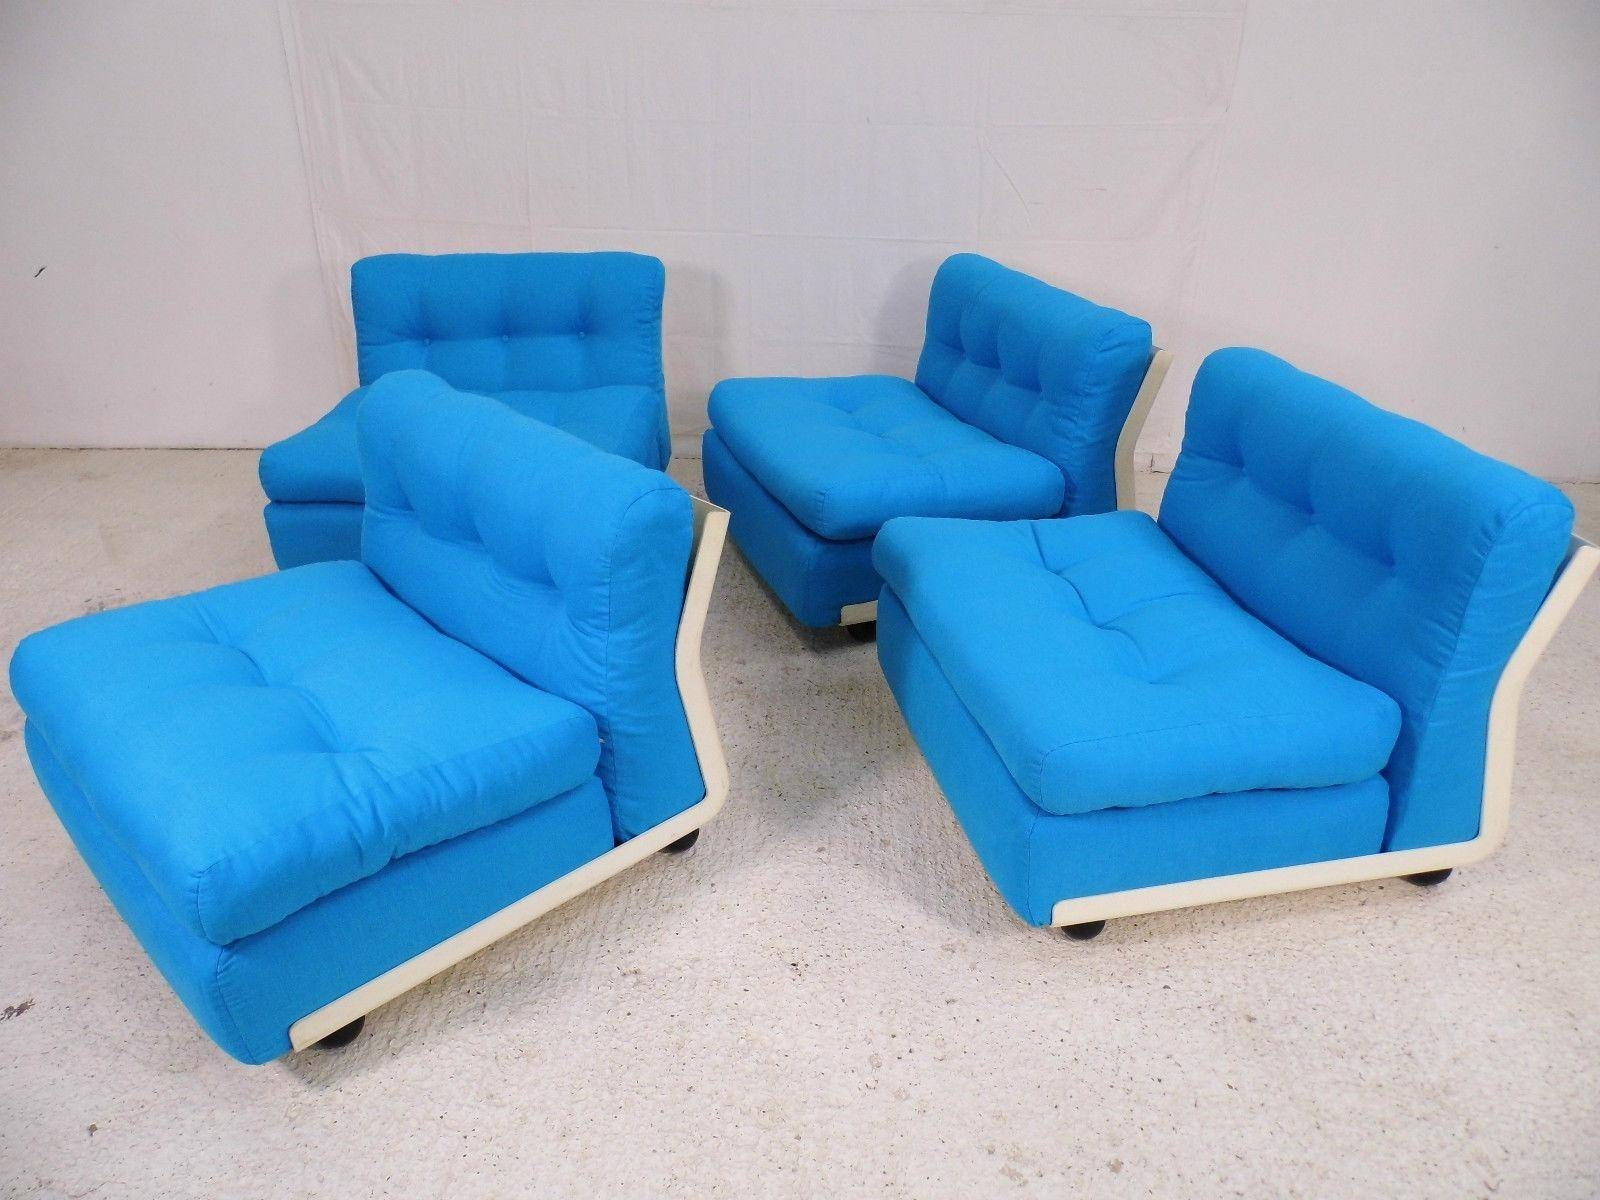 20+ Choices Of Bellini Sofas | Sofa Ideas for Bellini Sofas (Image 1 of 15)